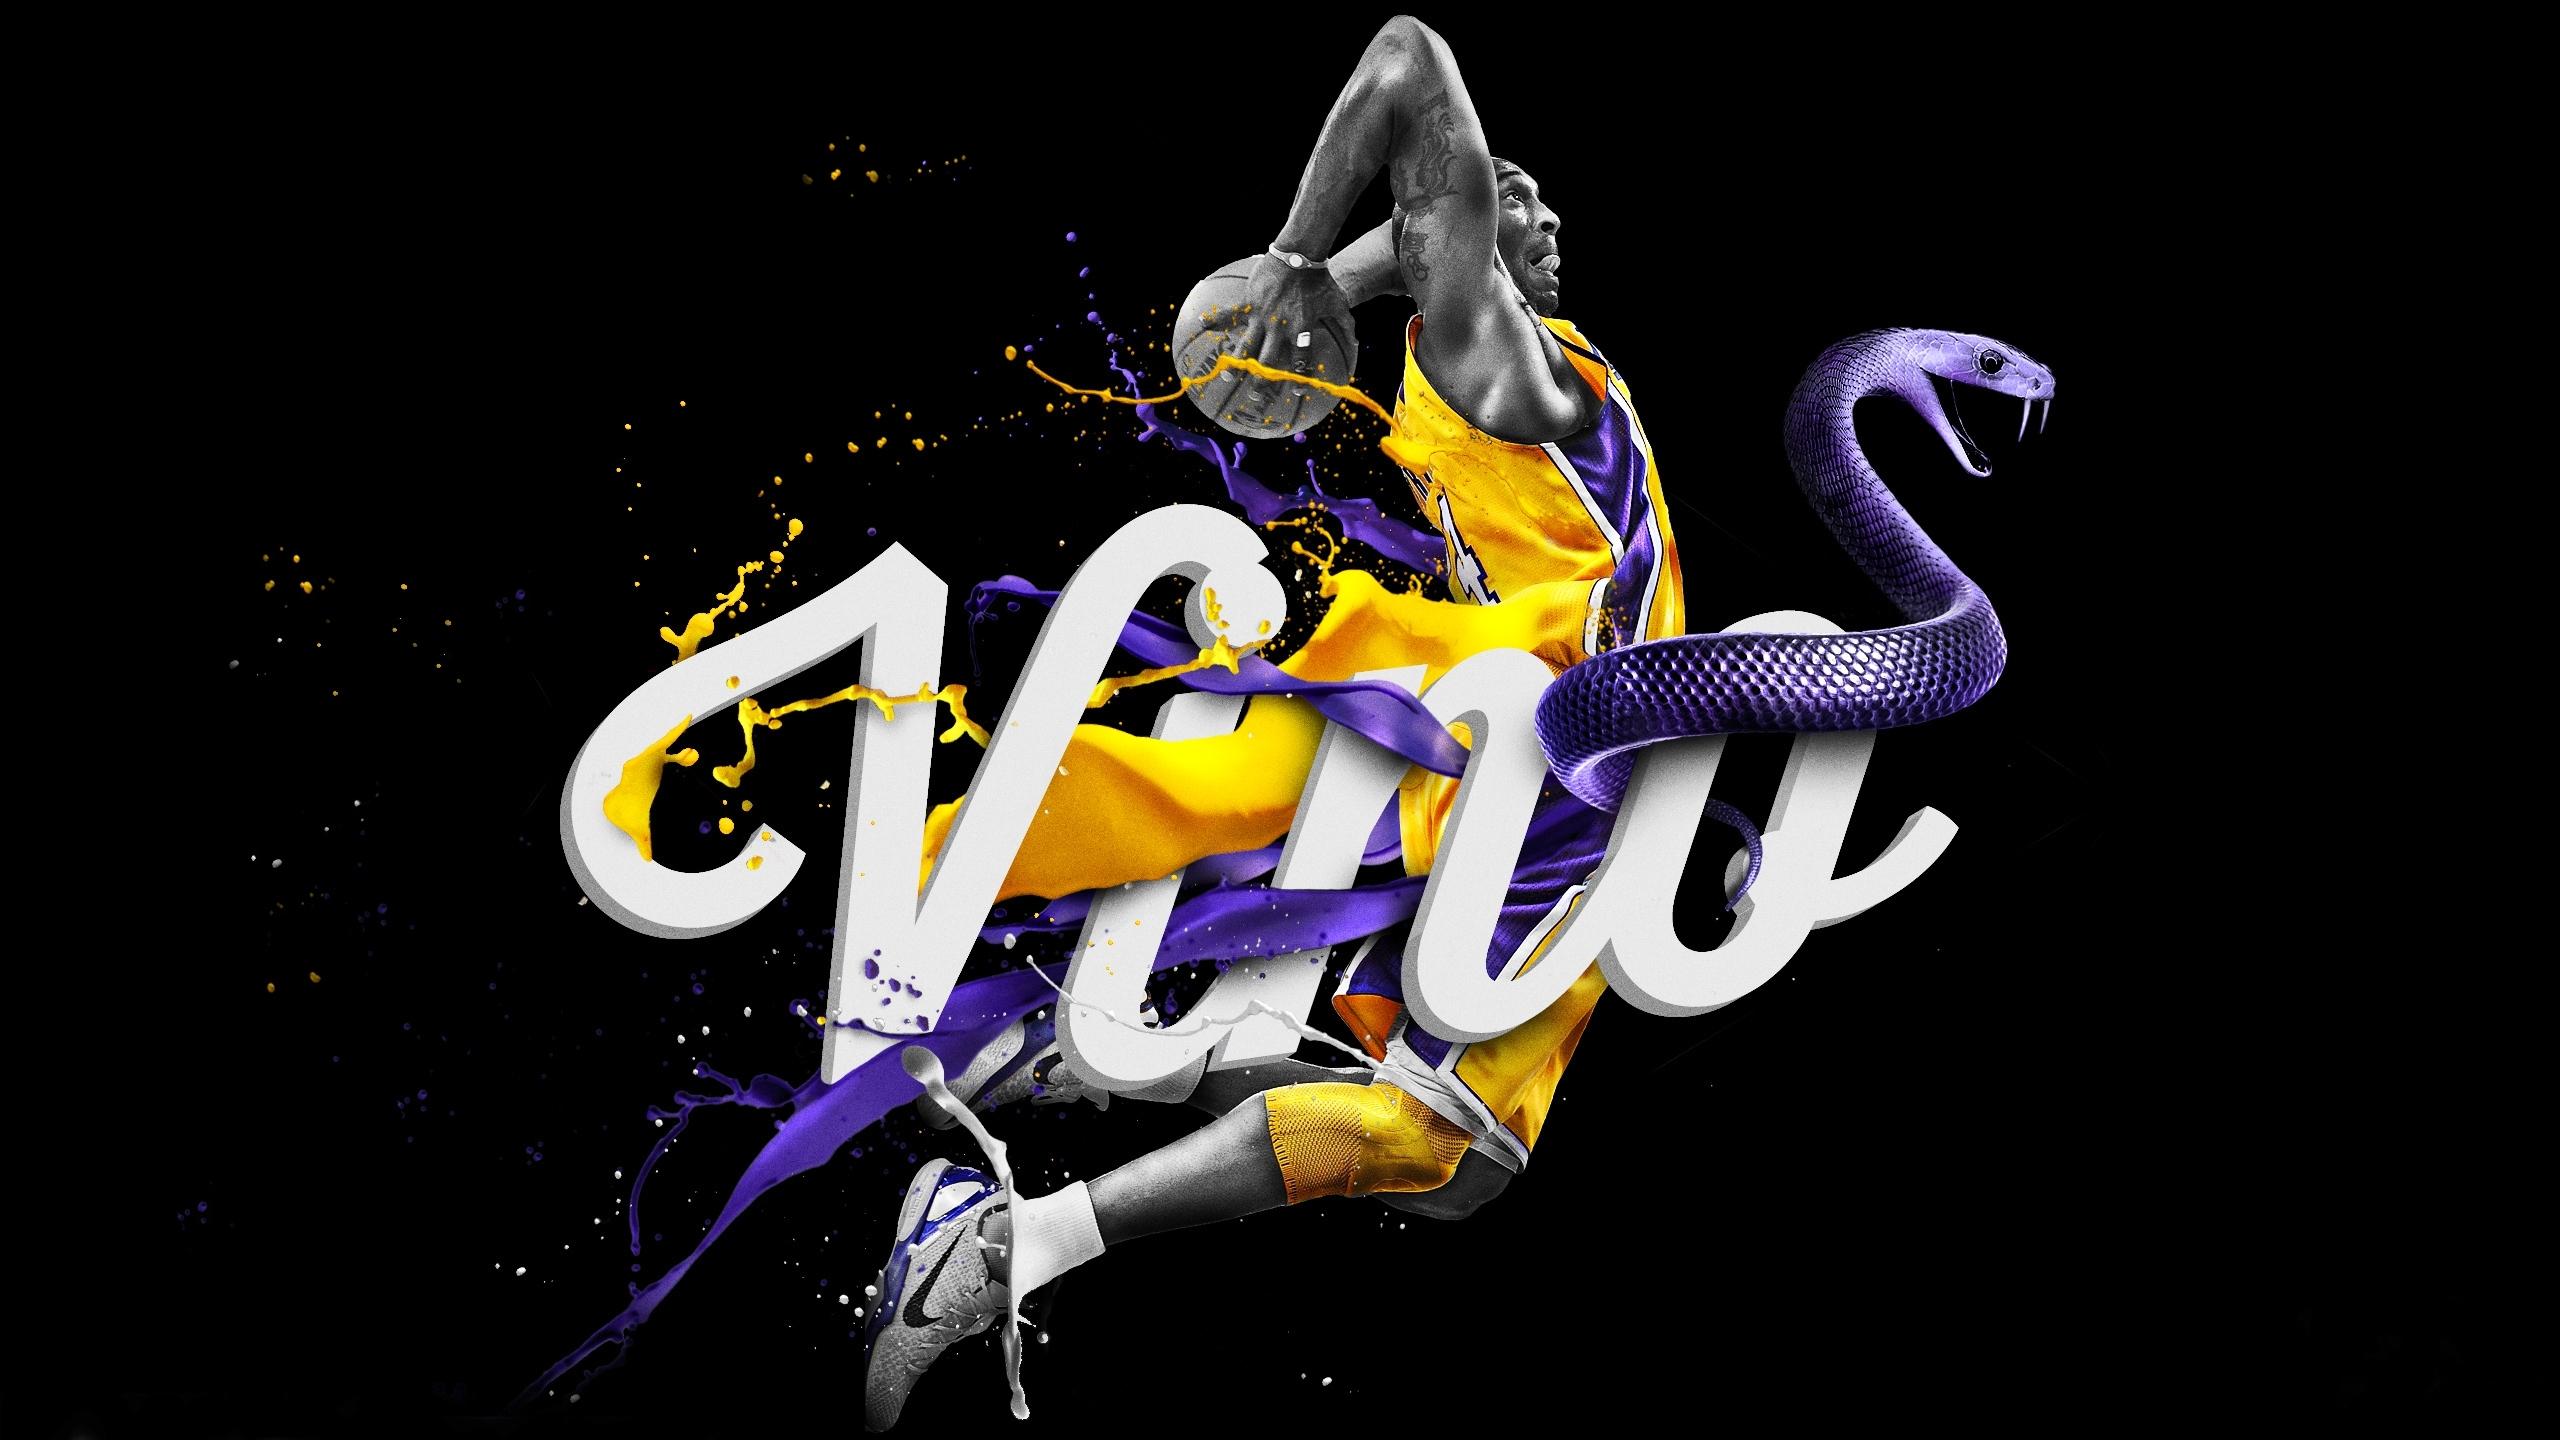 Los Angeles Lakers Nba Kobe Bryant Wallpaper Hd Sports 4k